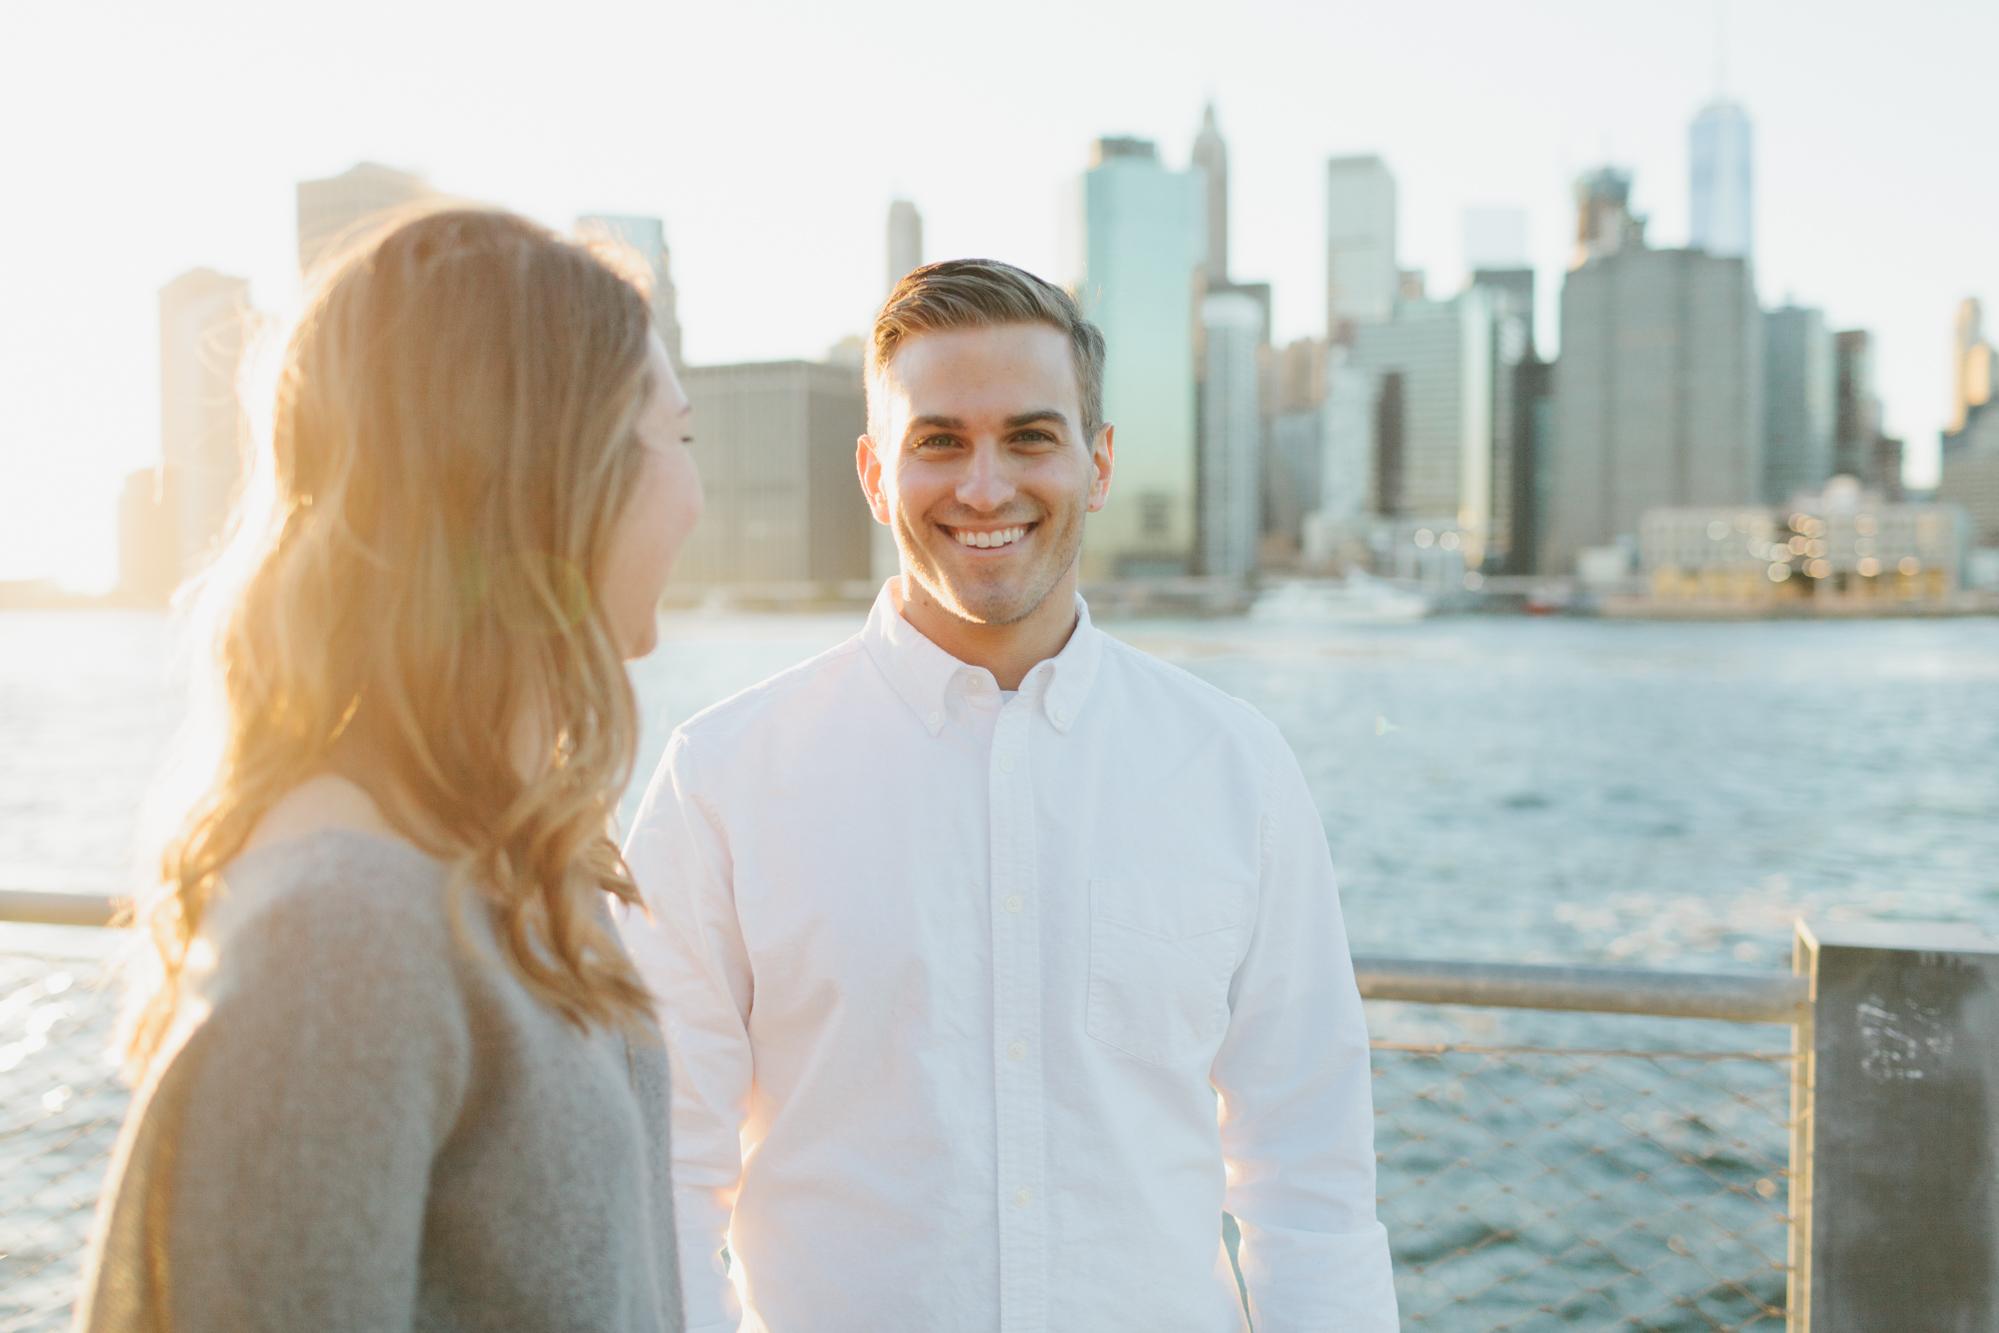 Brooklyn New York Wedding Photographer Mae Stier-026.jpg